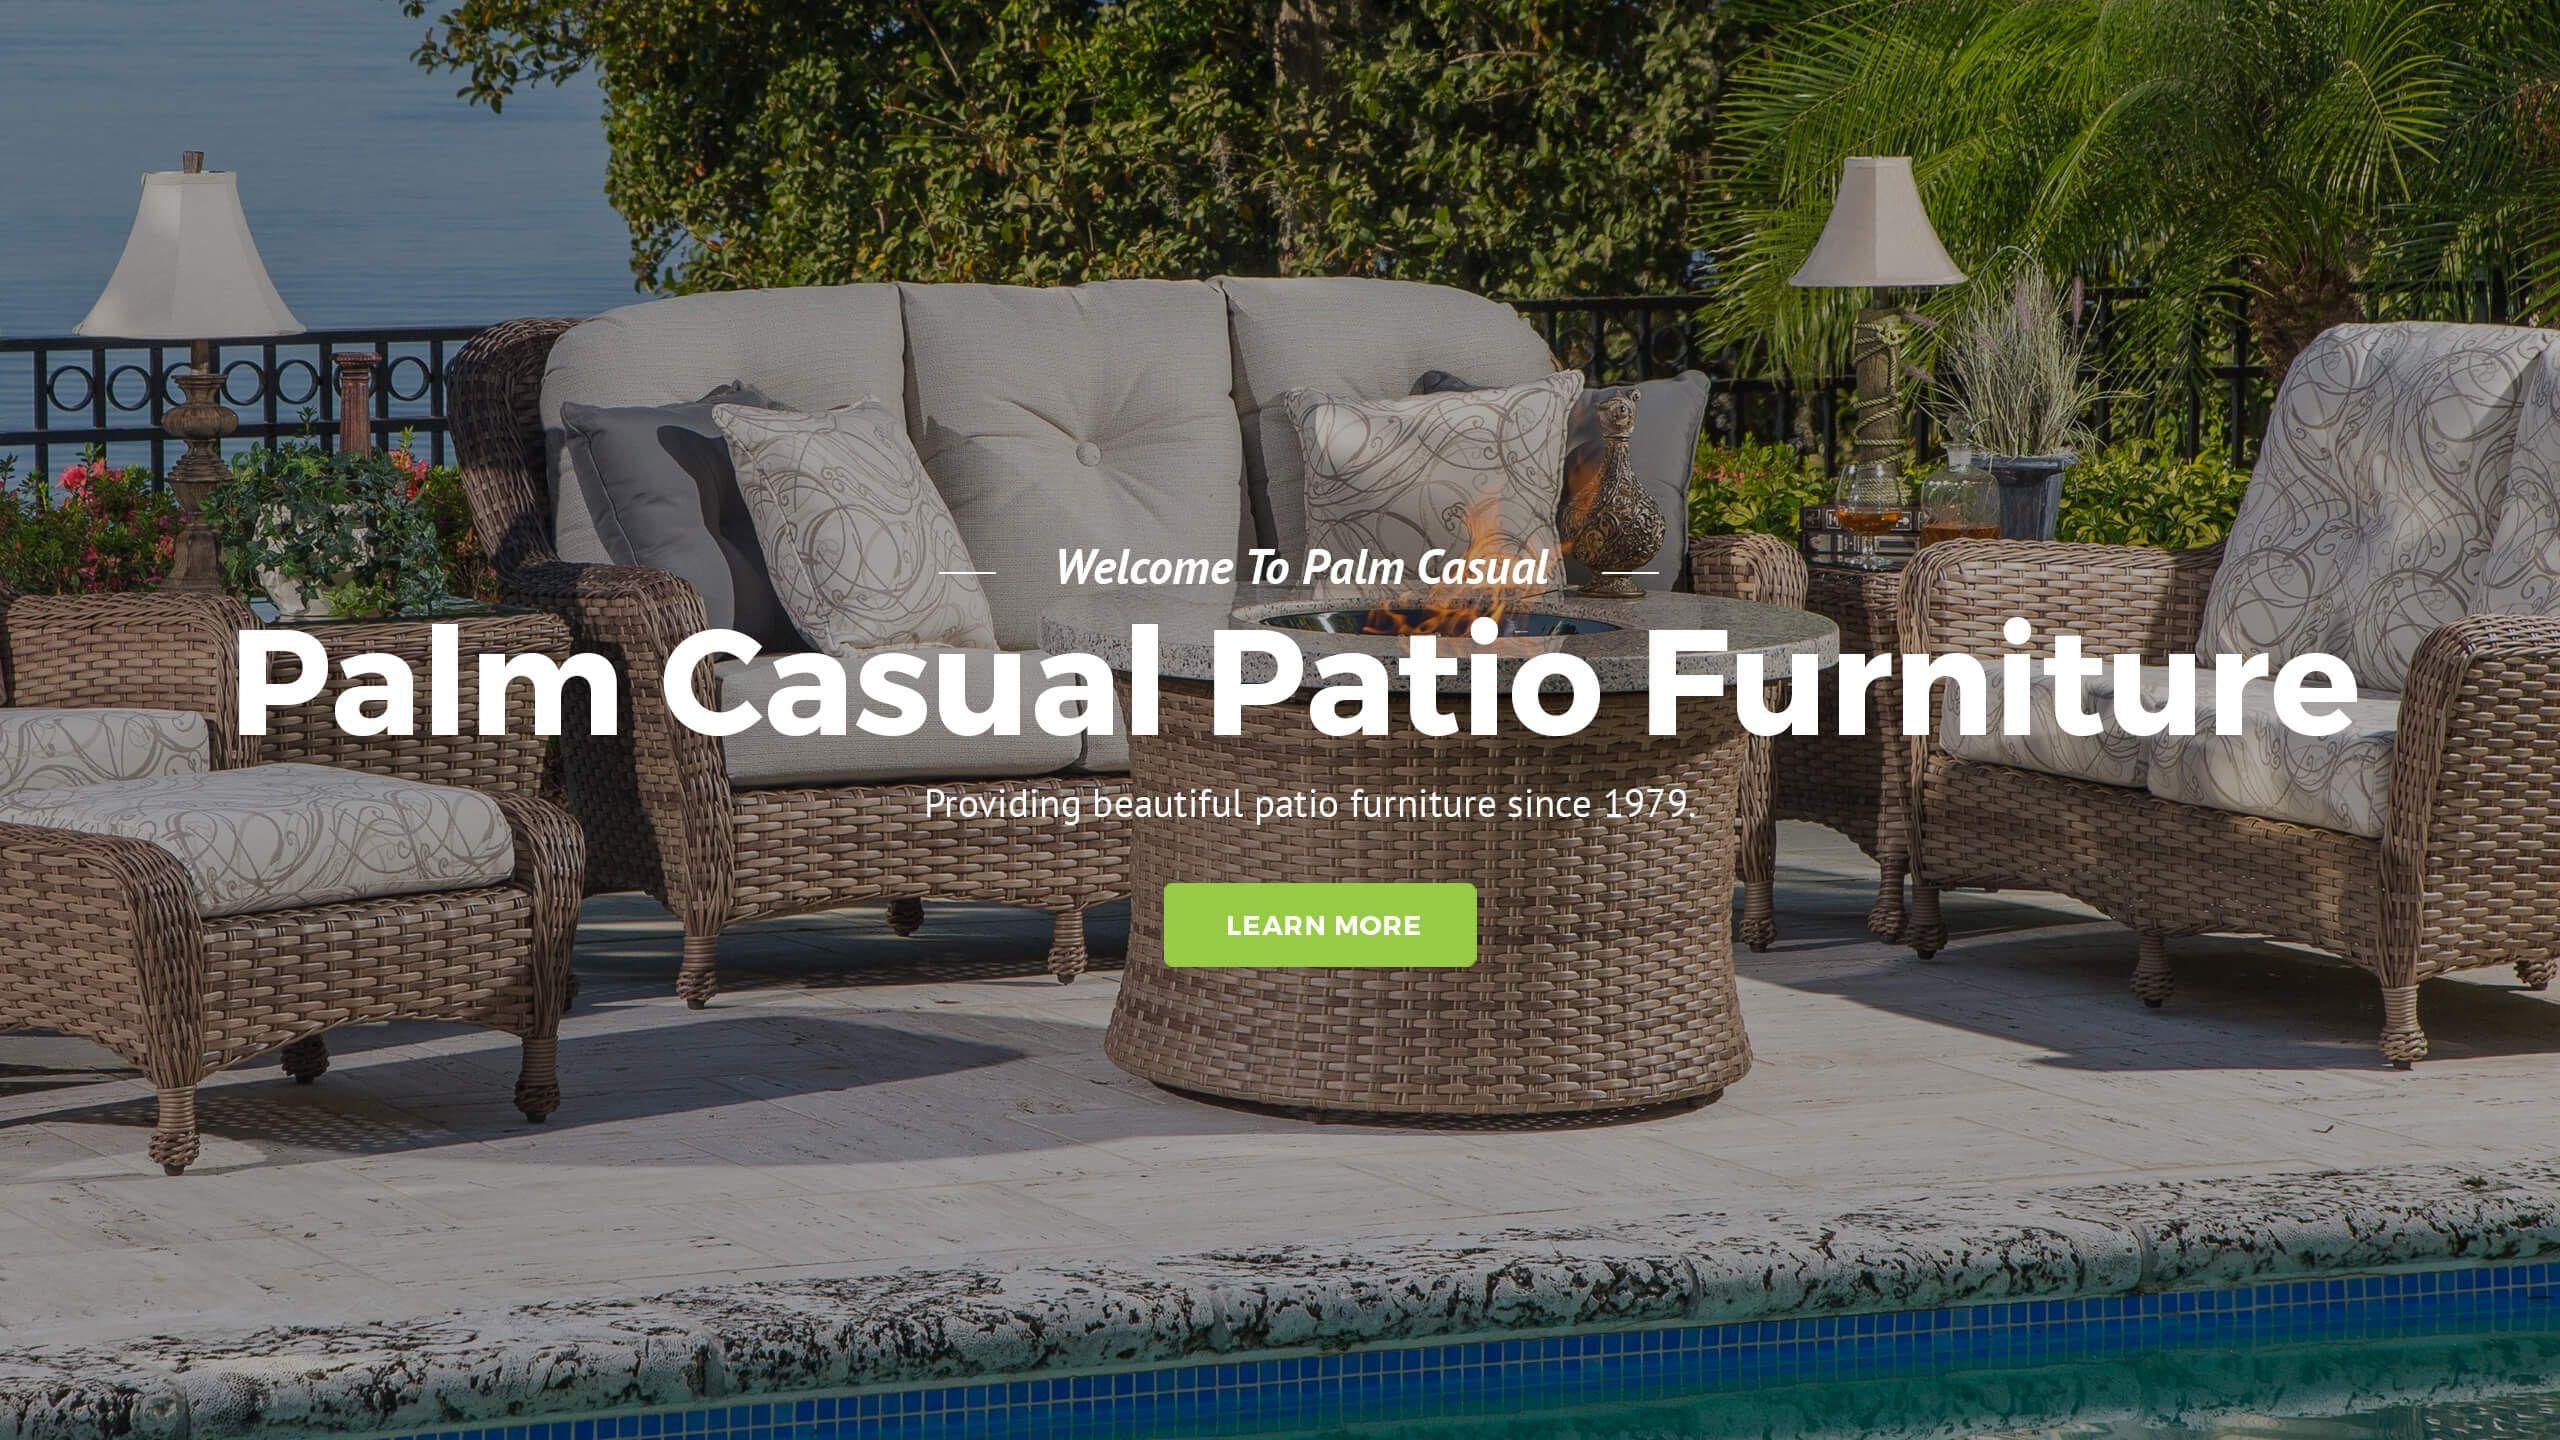 Fabrics Pvc Pipe Furniture